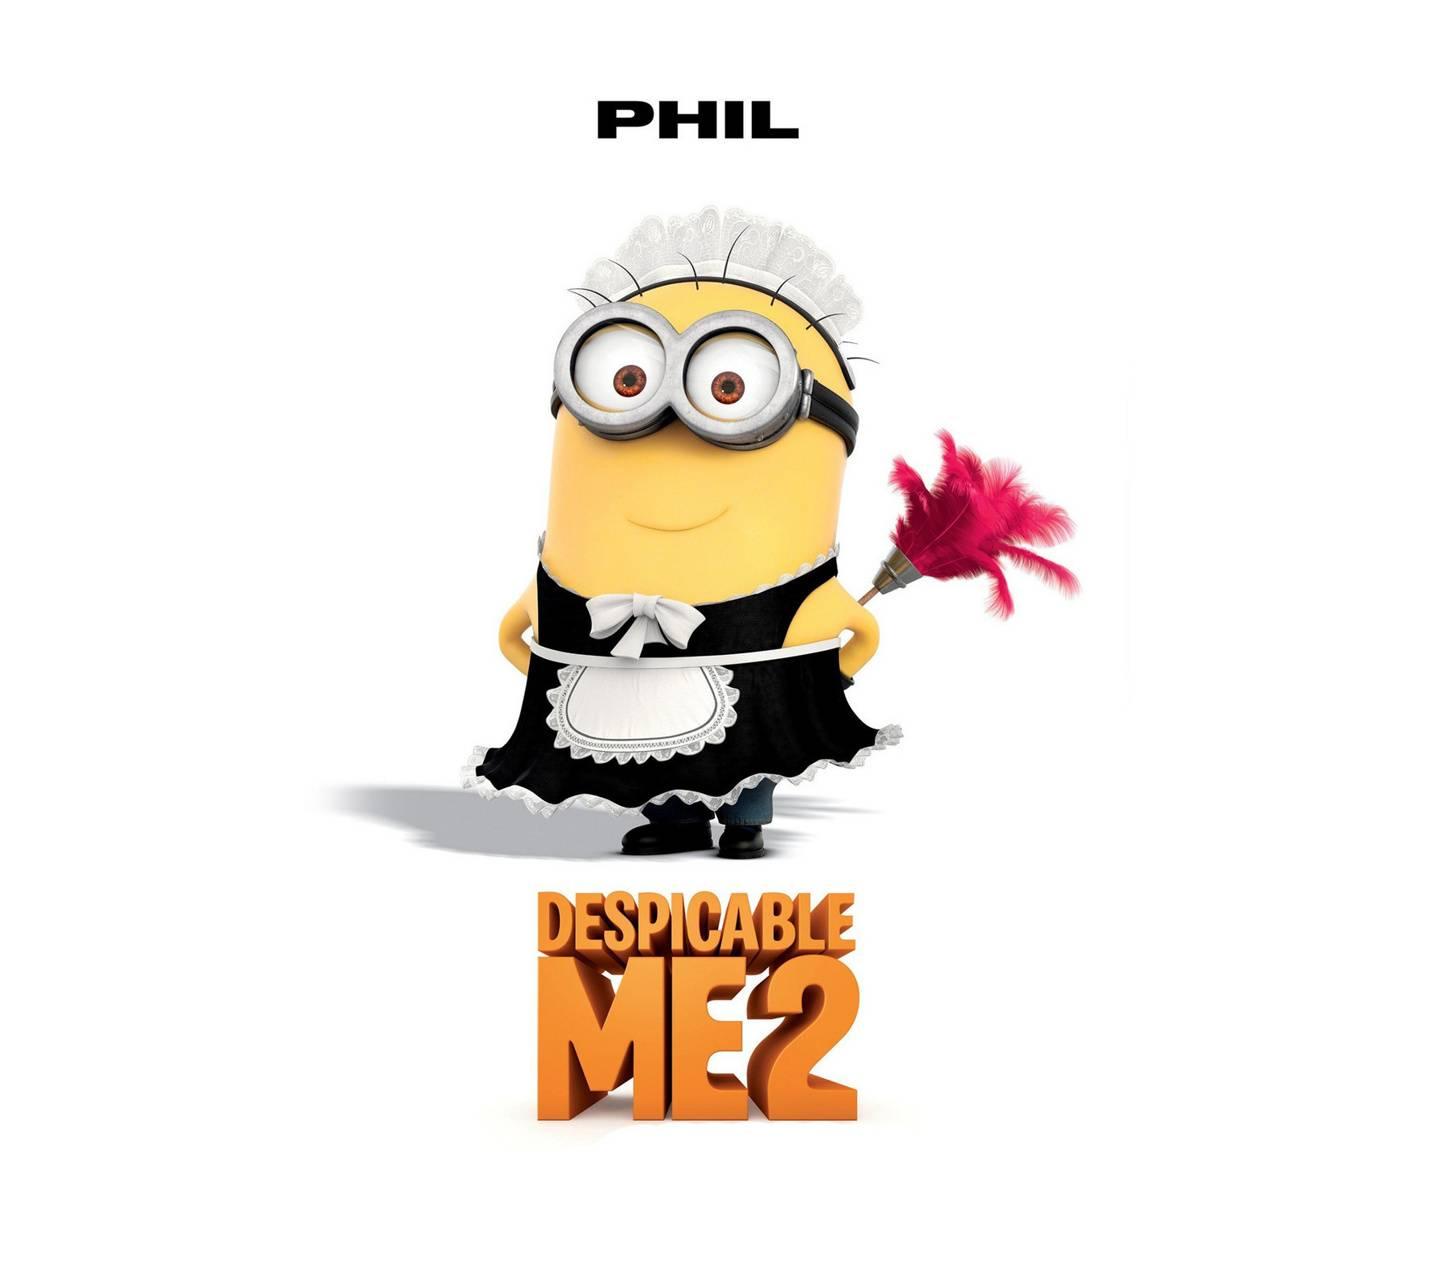 Phil - Despicable Me